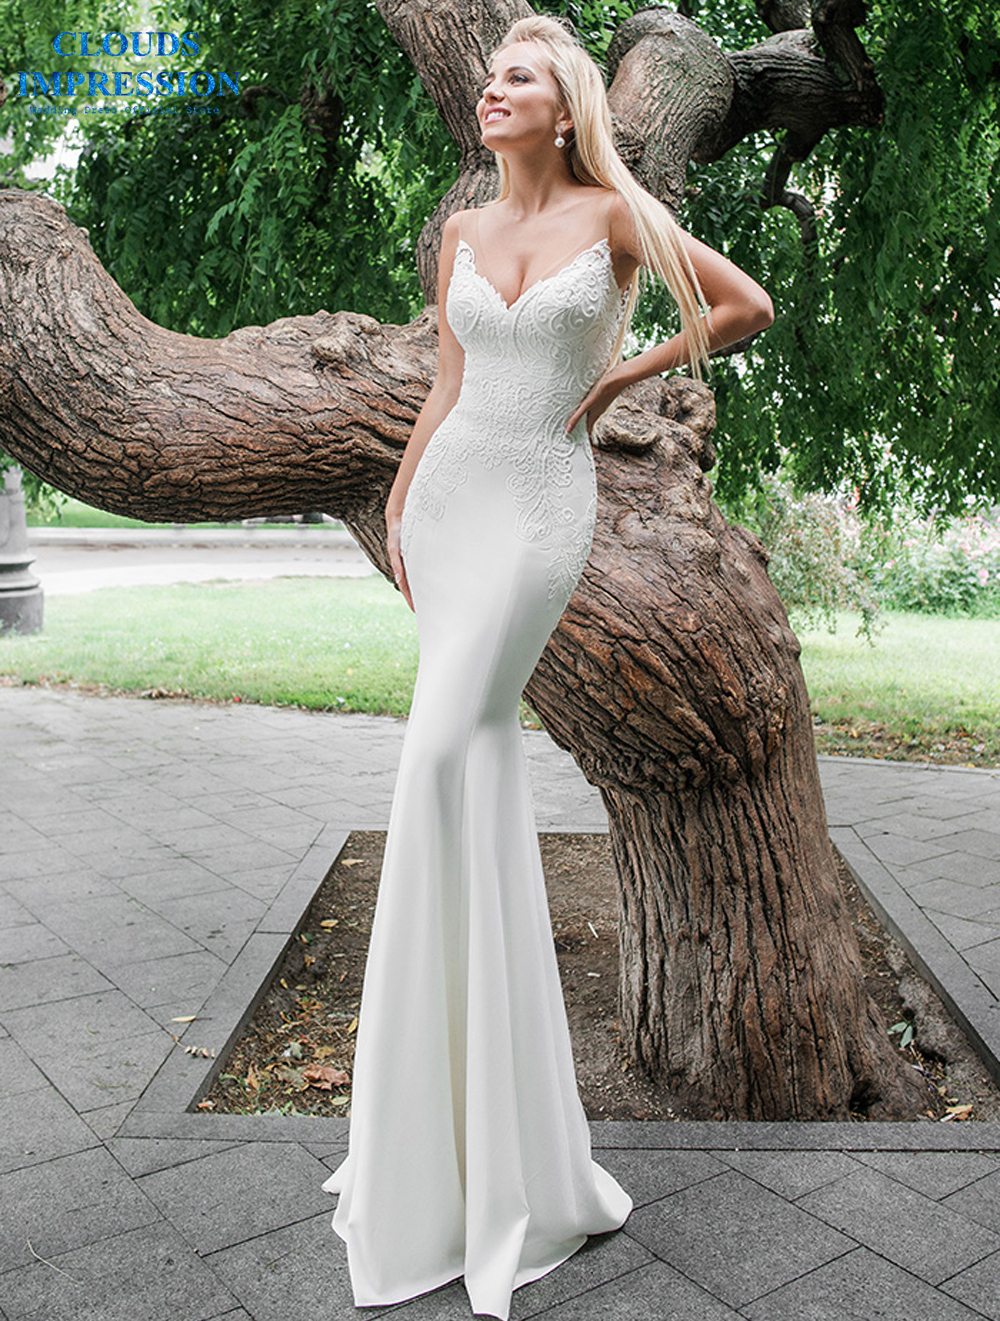 CLOUDS IMPRESSION Sexy Mermaid Wedding Dress 2019 With Detachable Train Bridal Gown Vestido de Noiva Plus